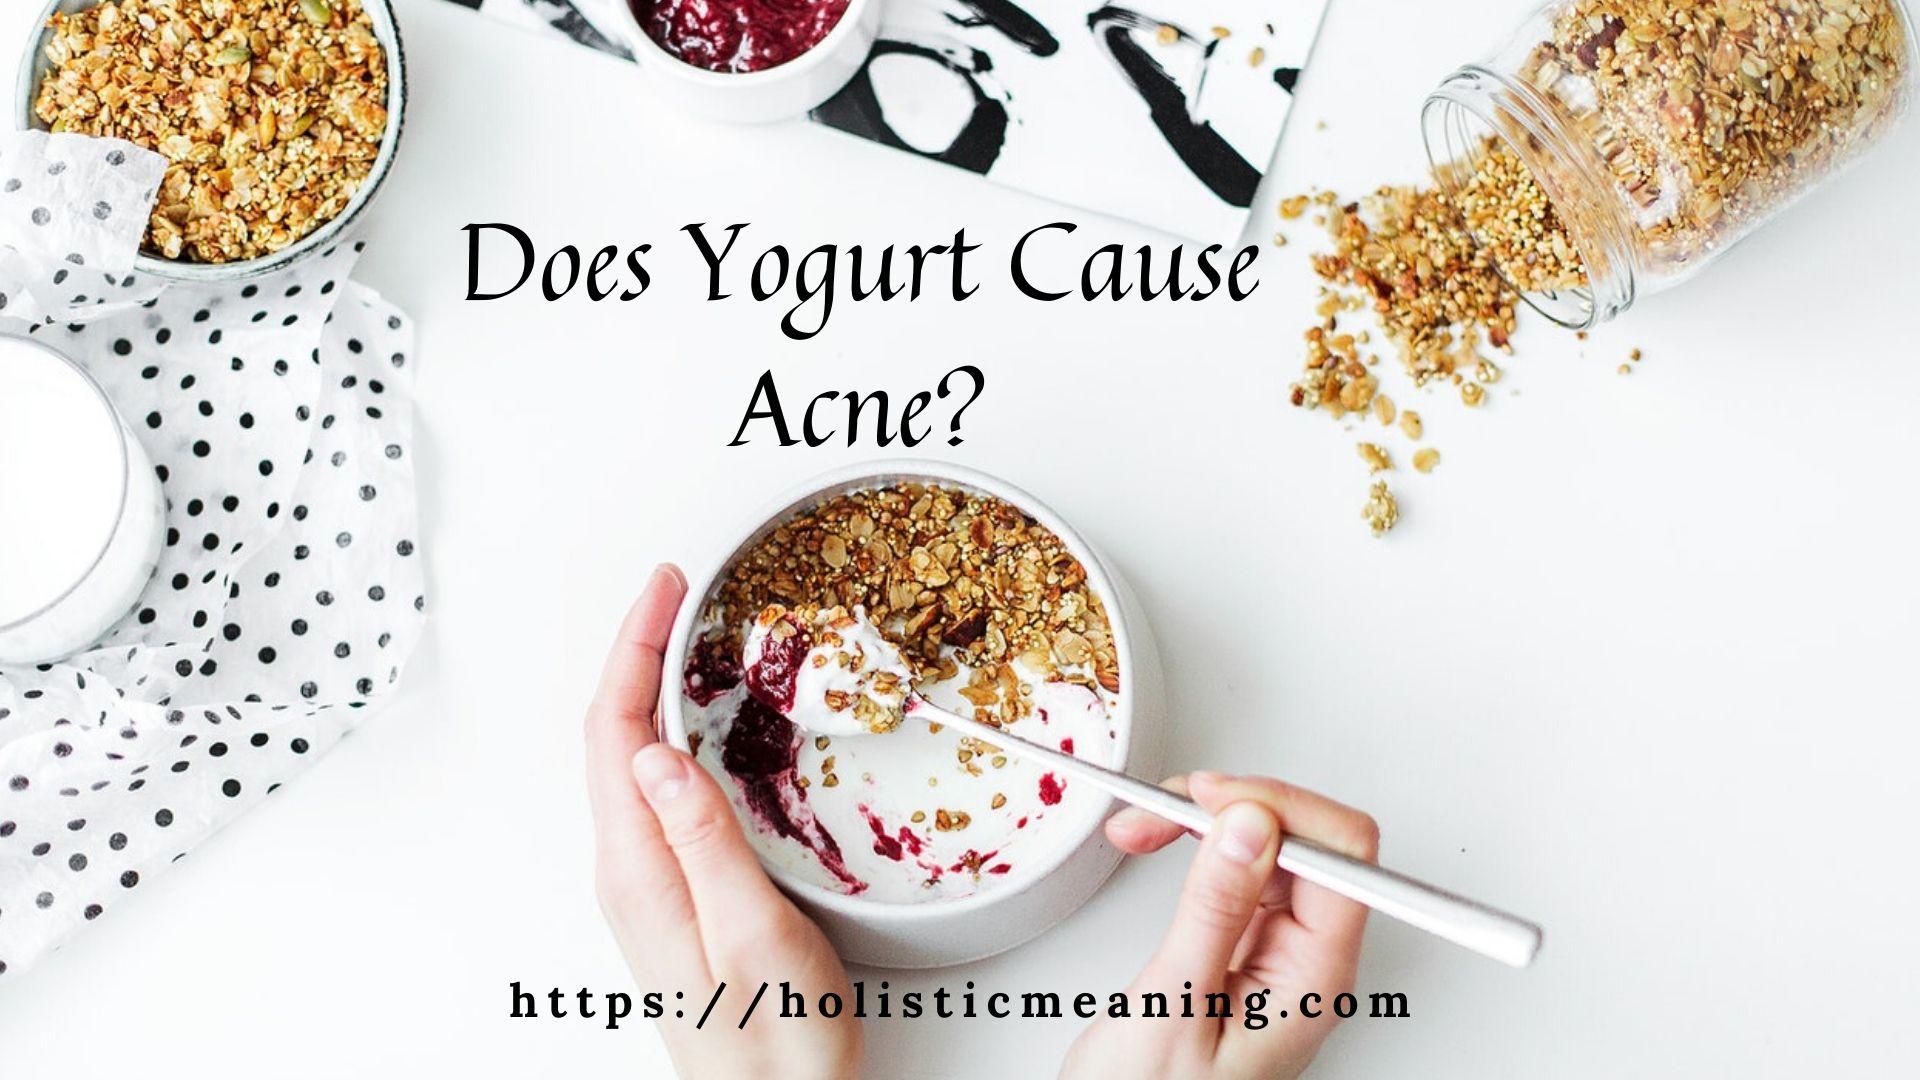 Does Yogurt Cause Acne